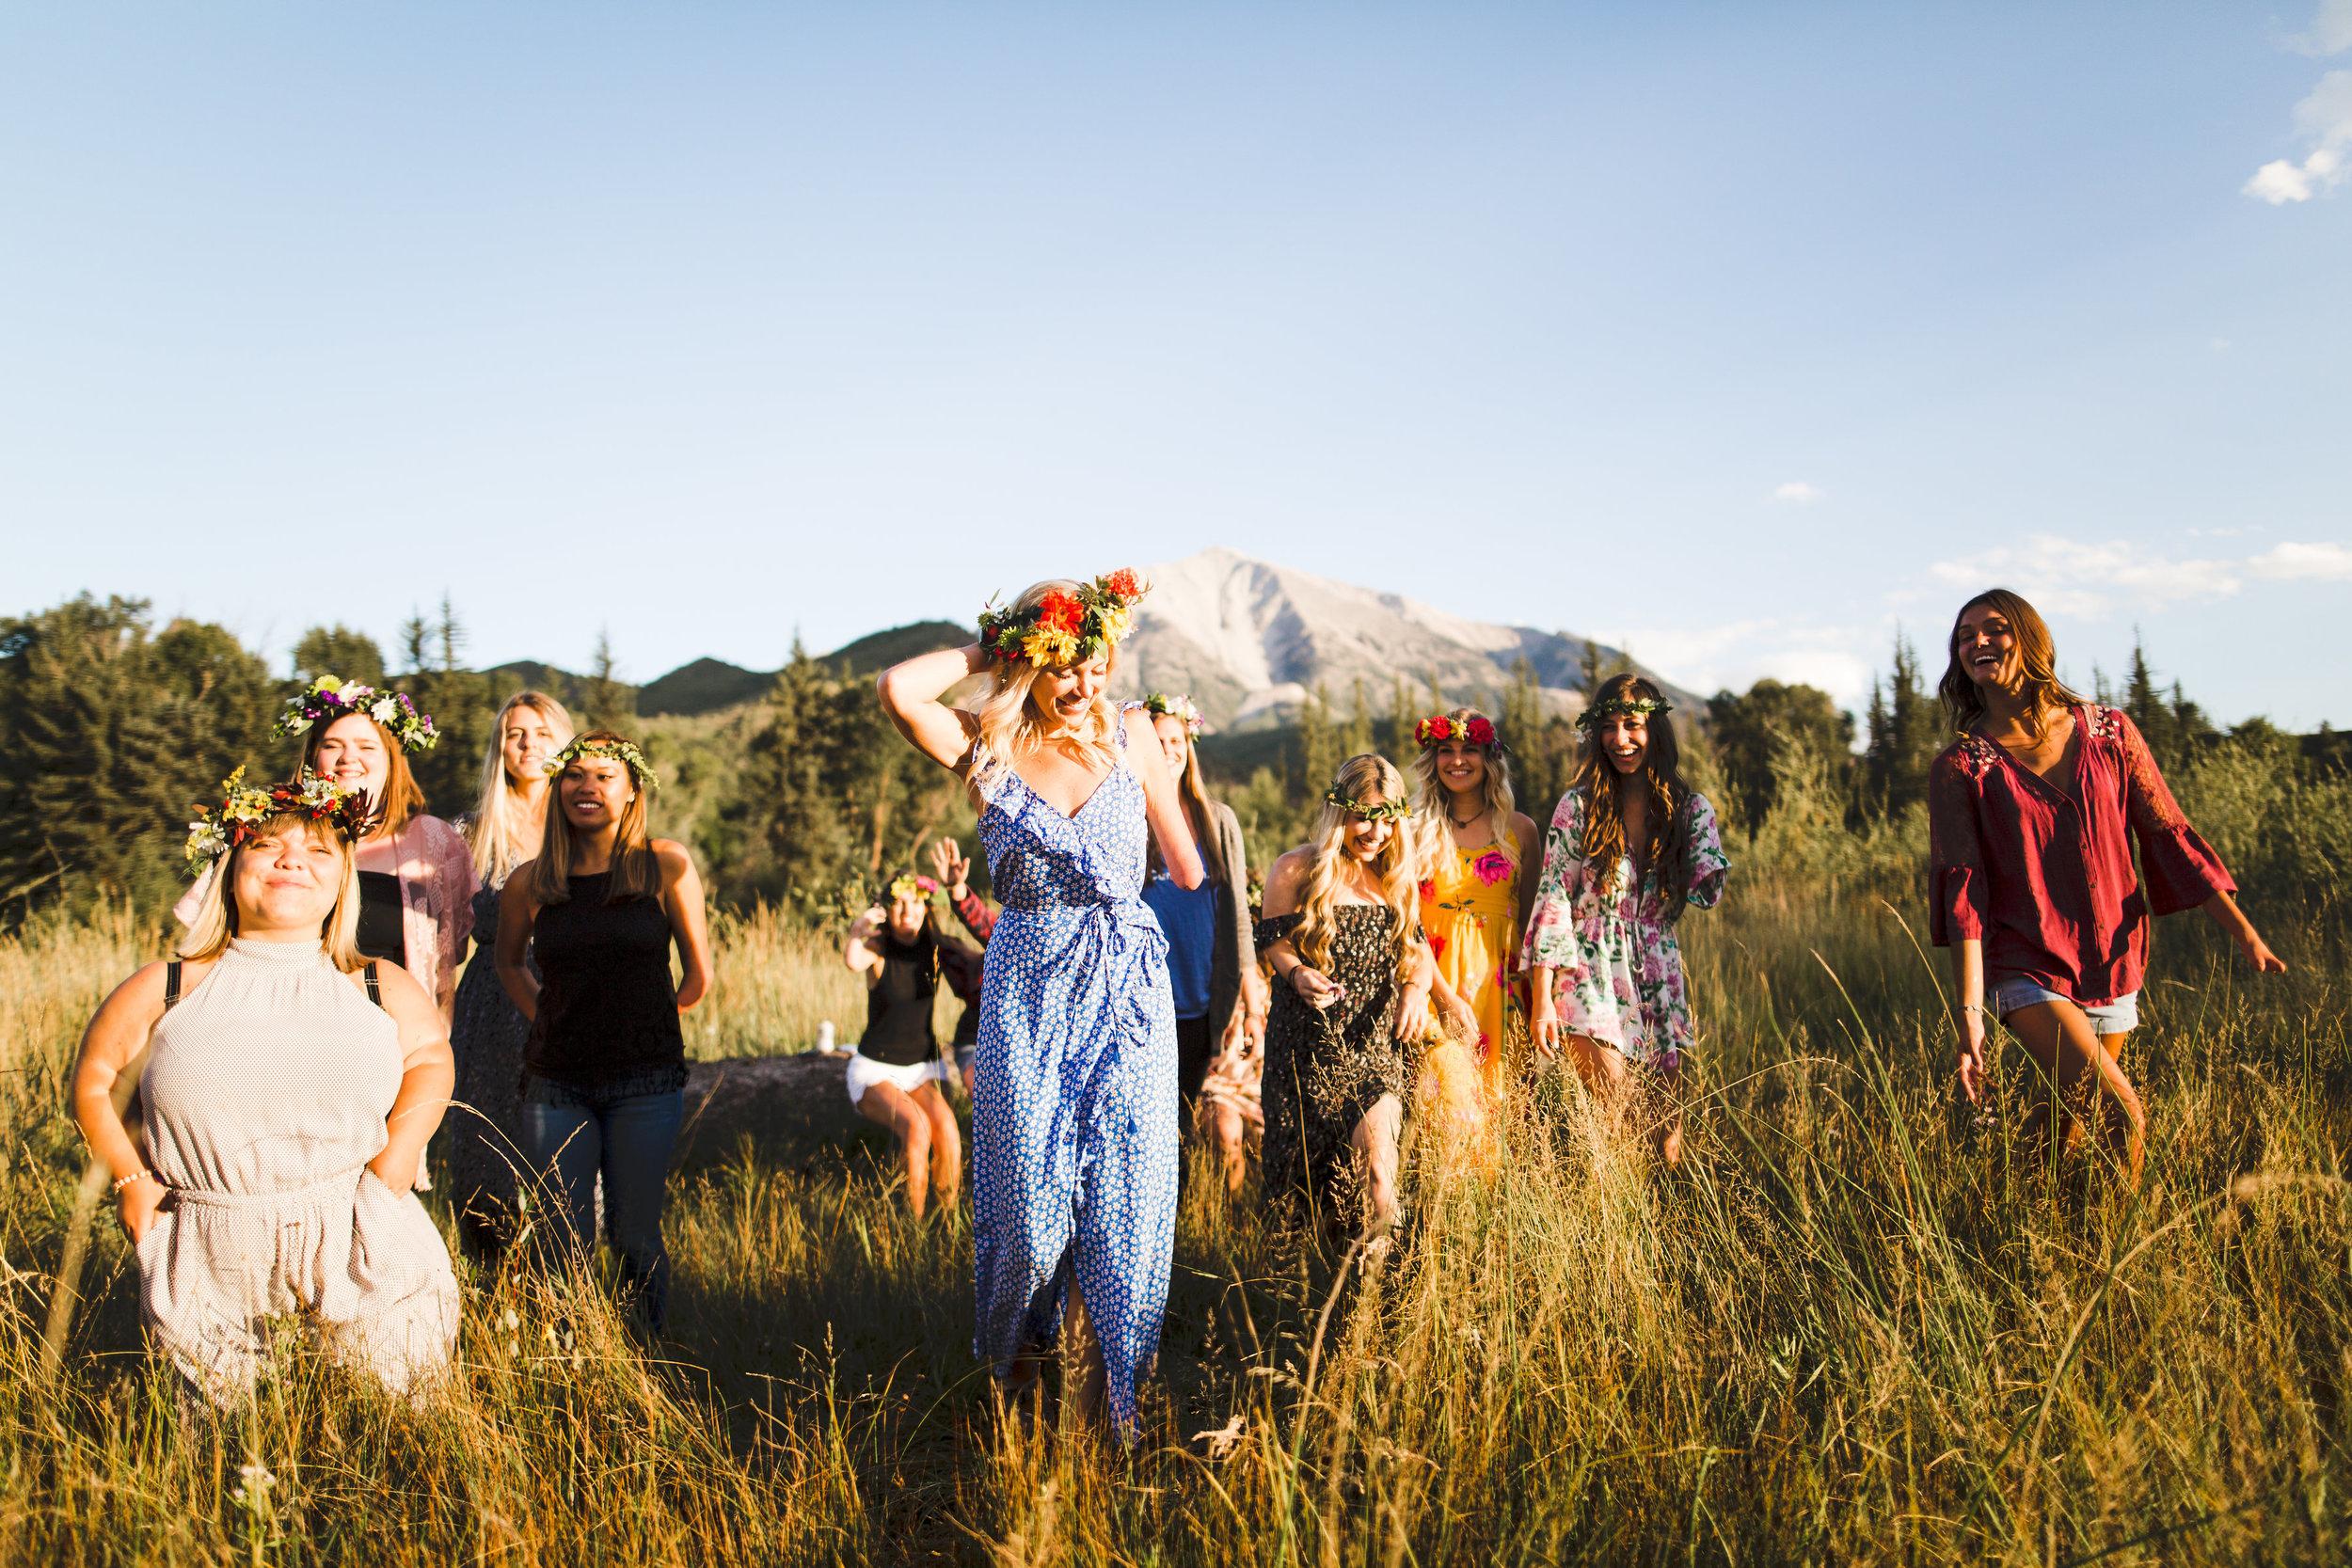 0818-Shelift-Colorado-Portraits-Group-13.JPG